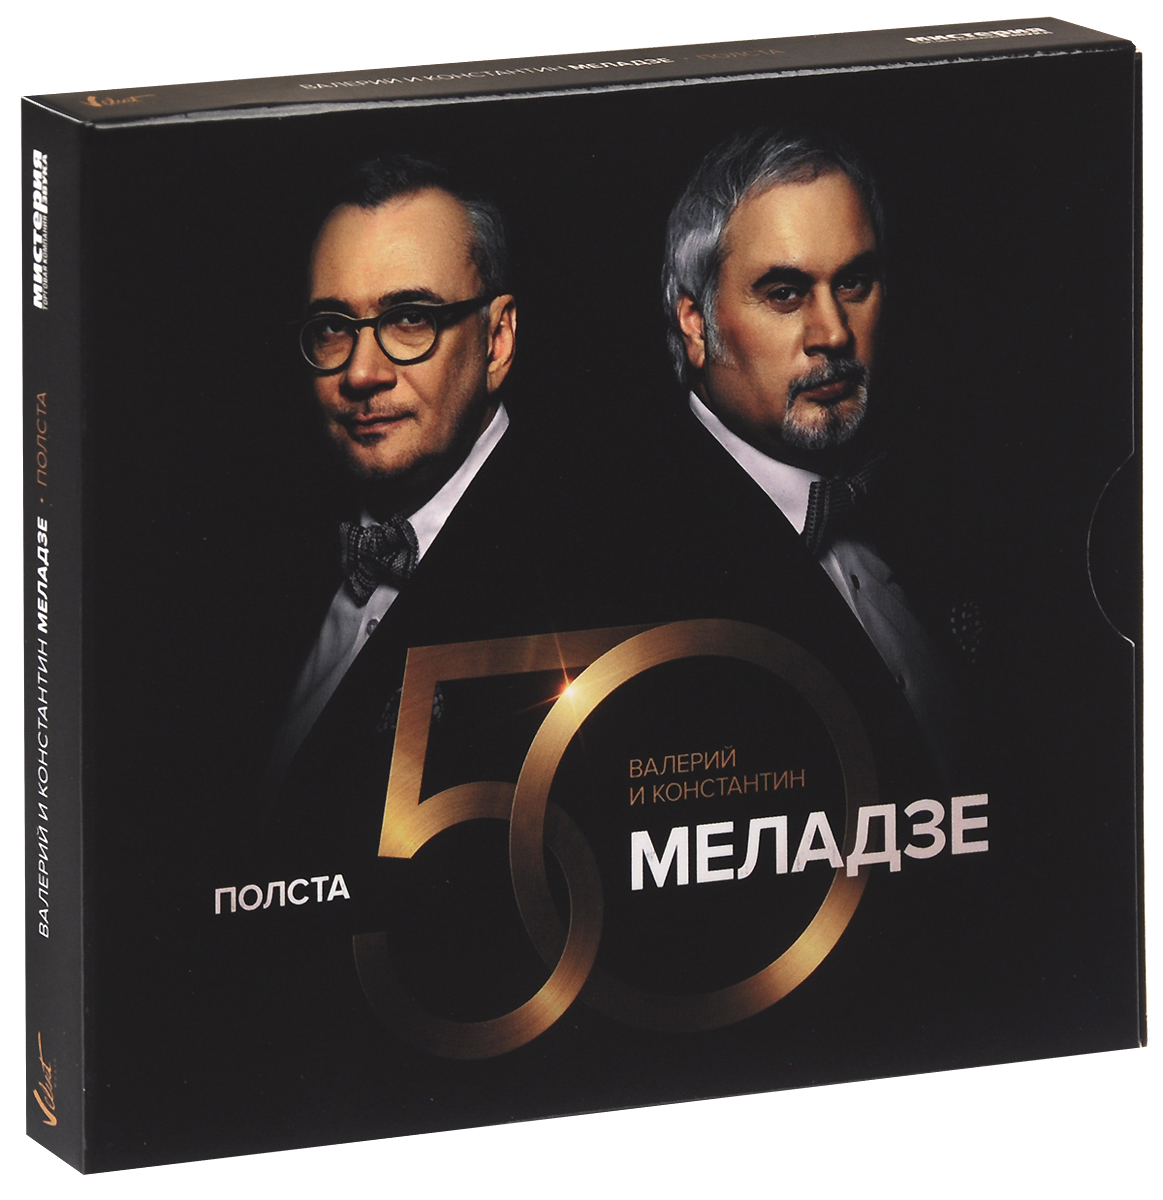 Валерий и Константин Меладзе. Полста